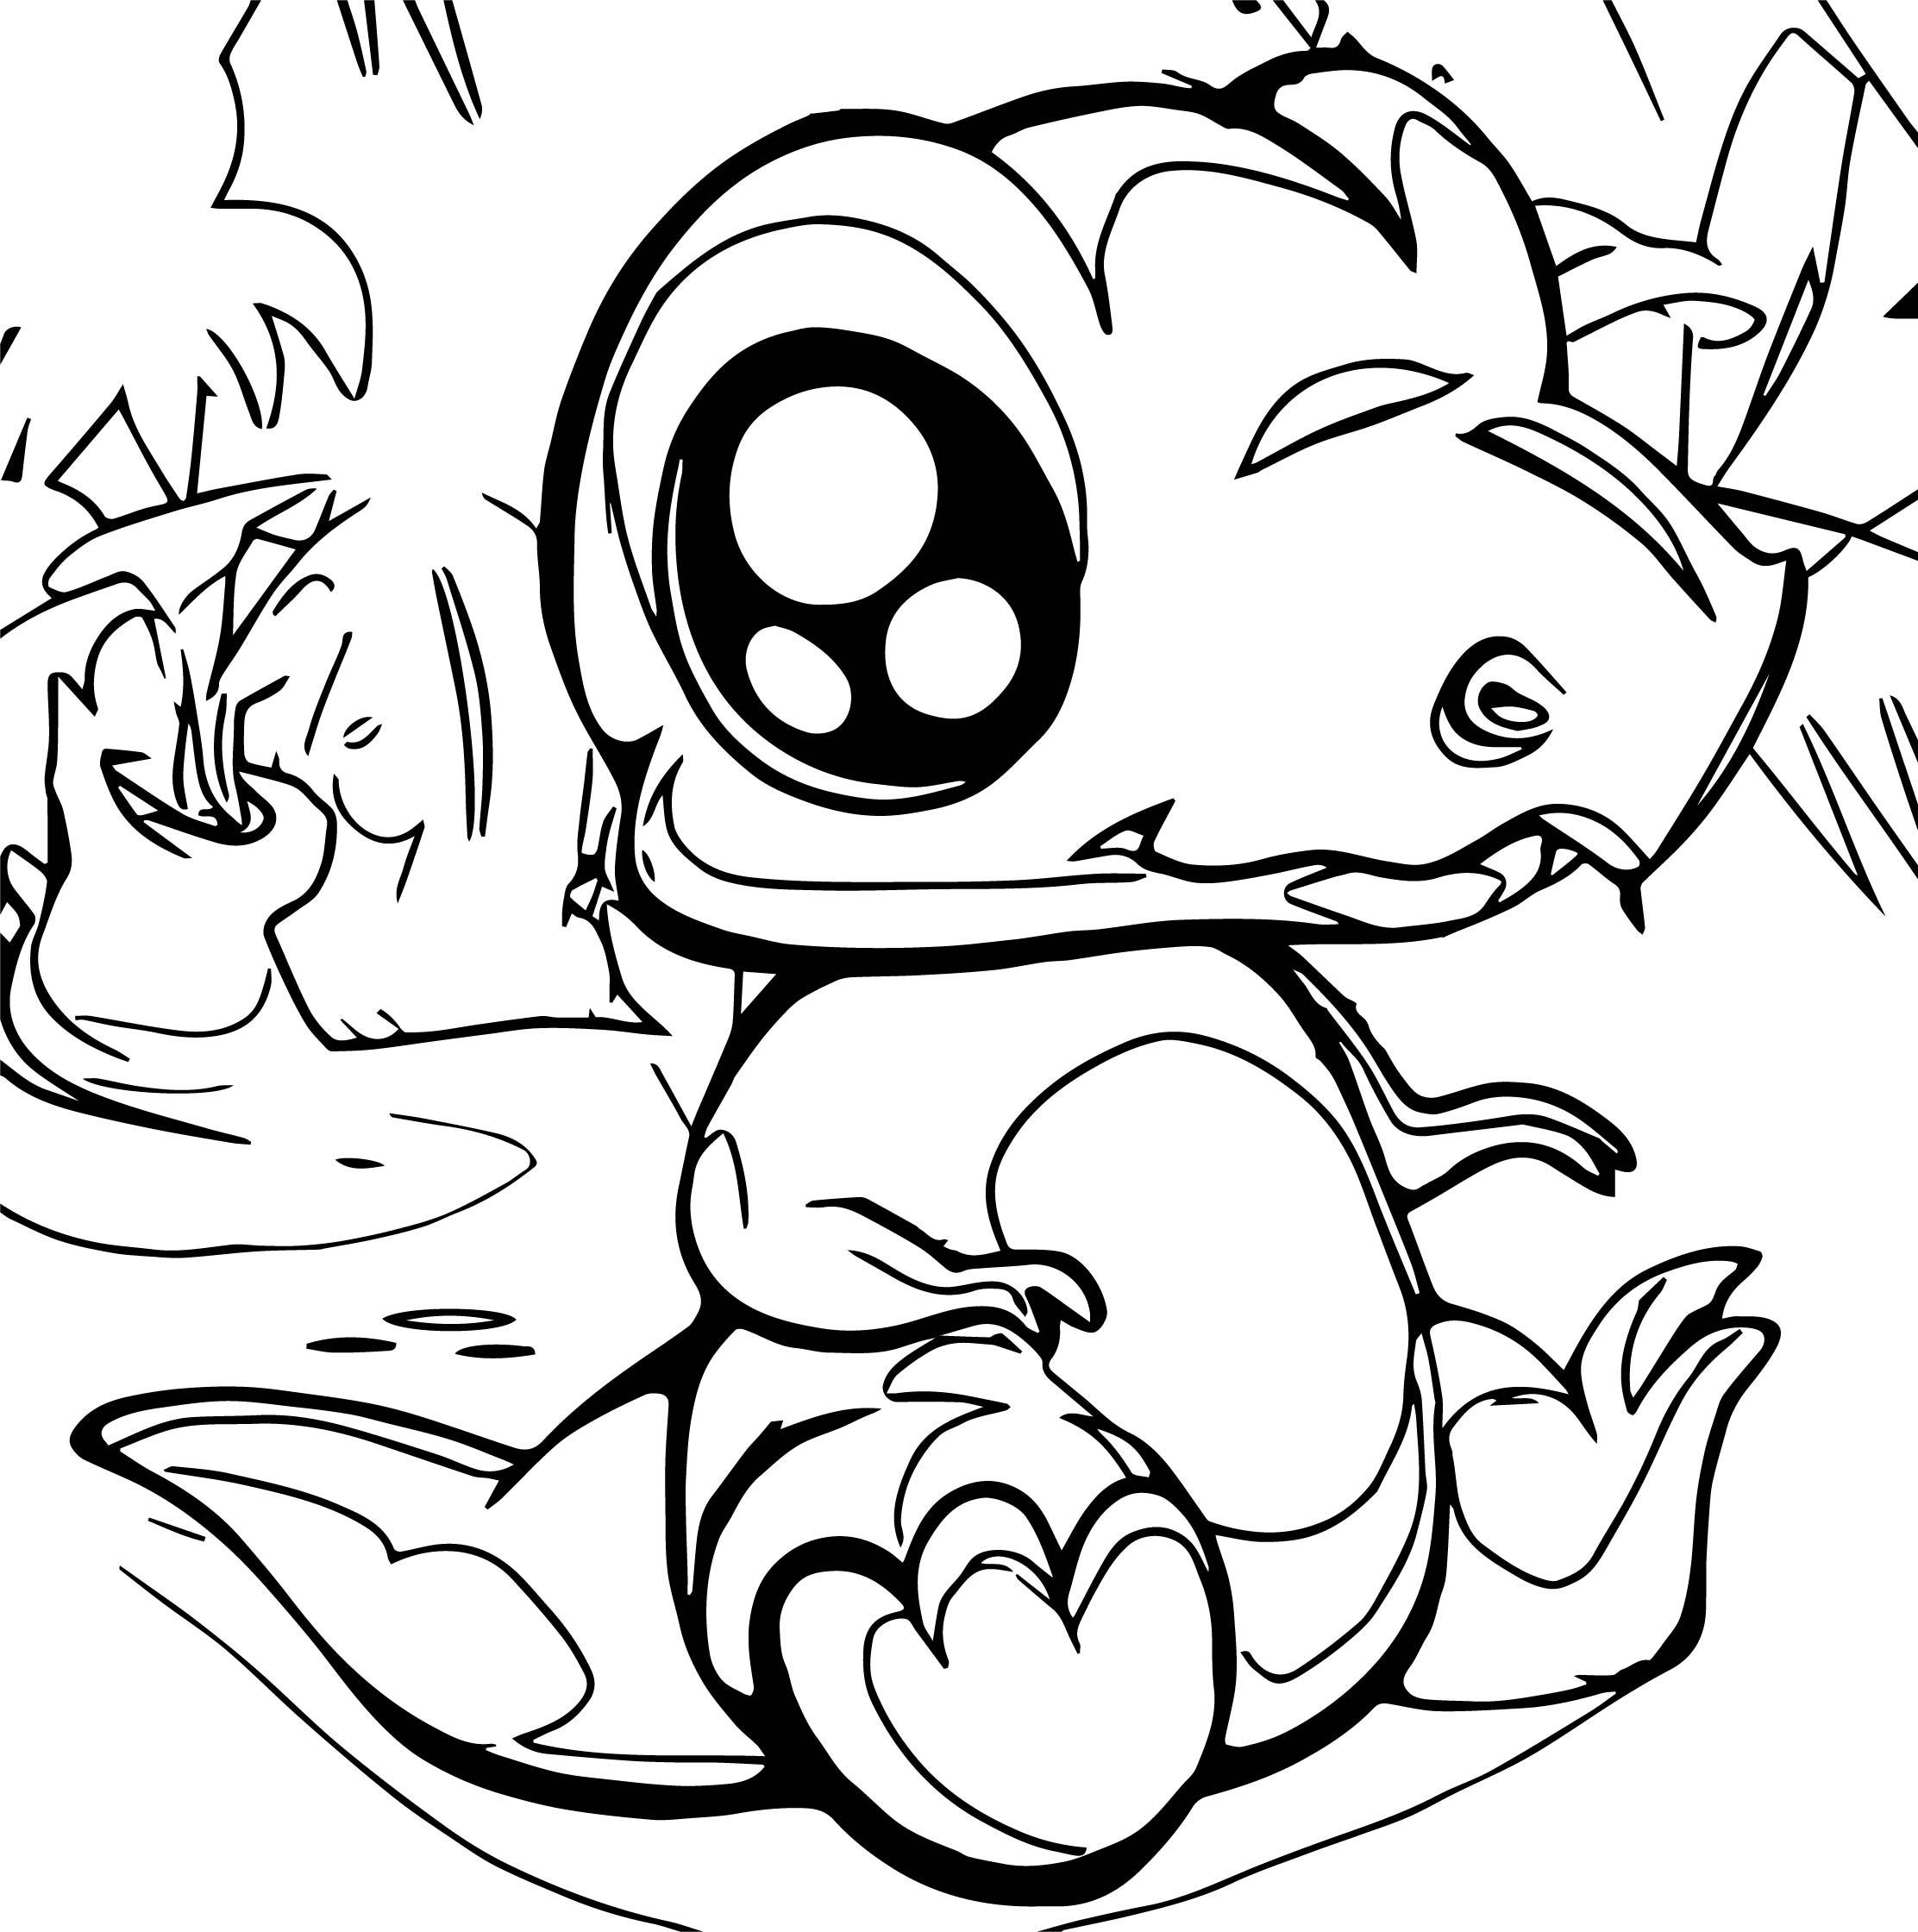 Dinosaur Head Drawing at GetDrawings | Free download